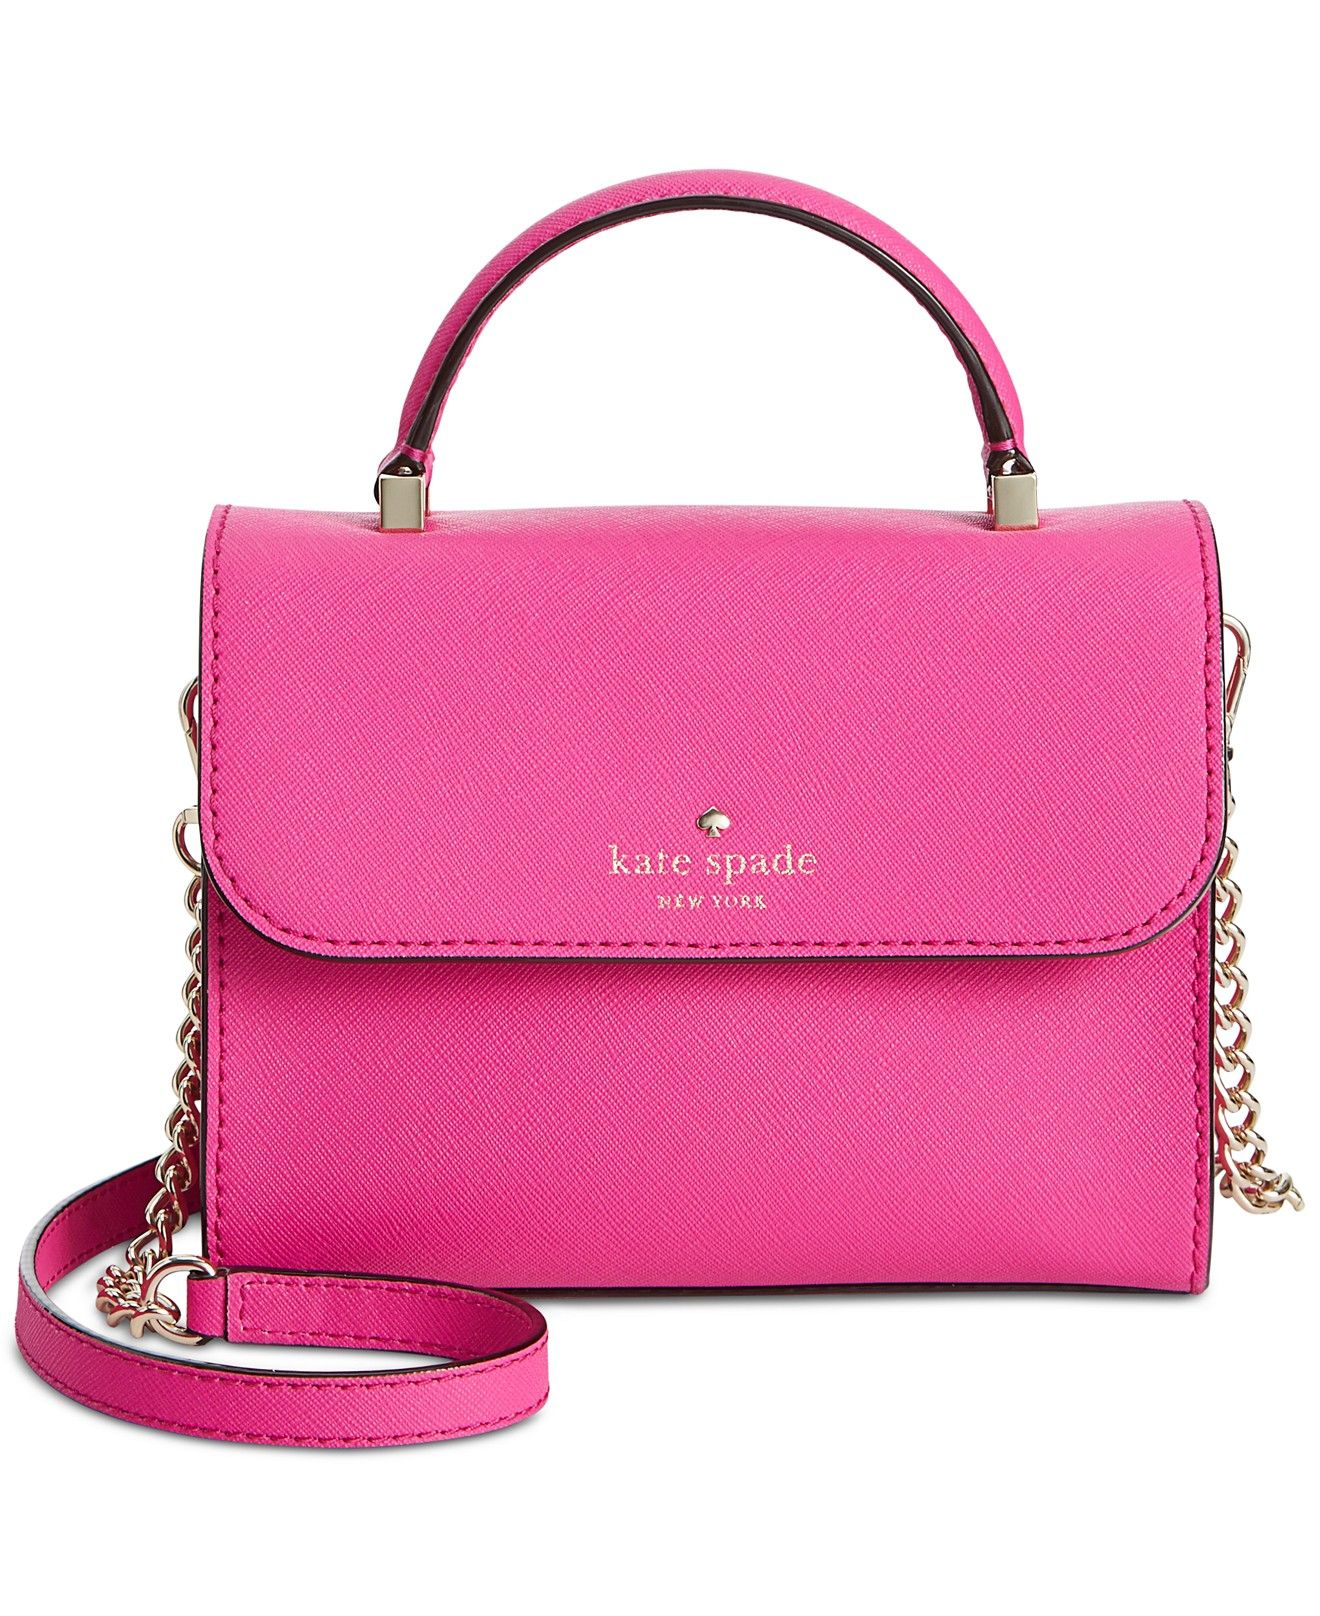 69543ba7be08 kate spade new york Mini Nora Flap Bag - Handbags   Accessories - Macy s